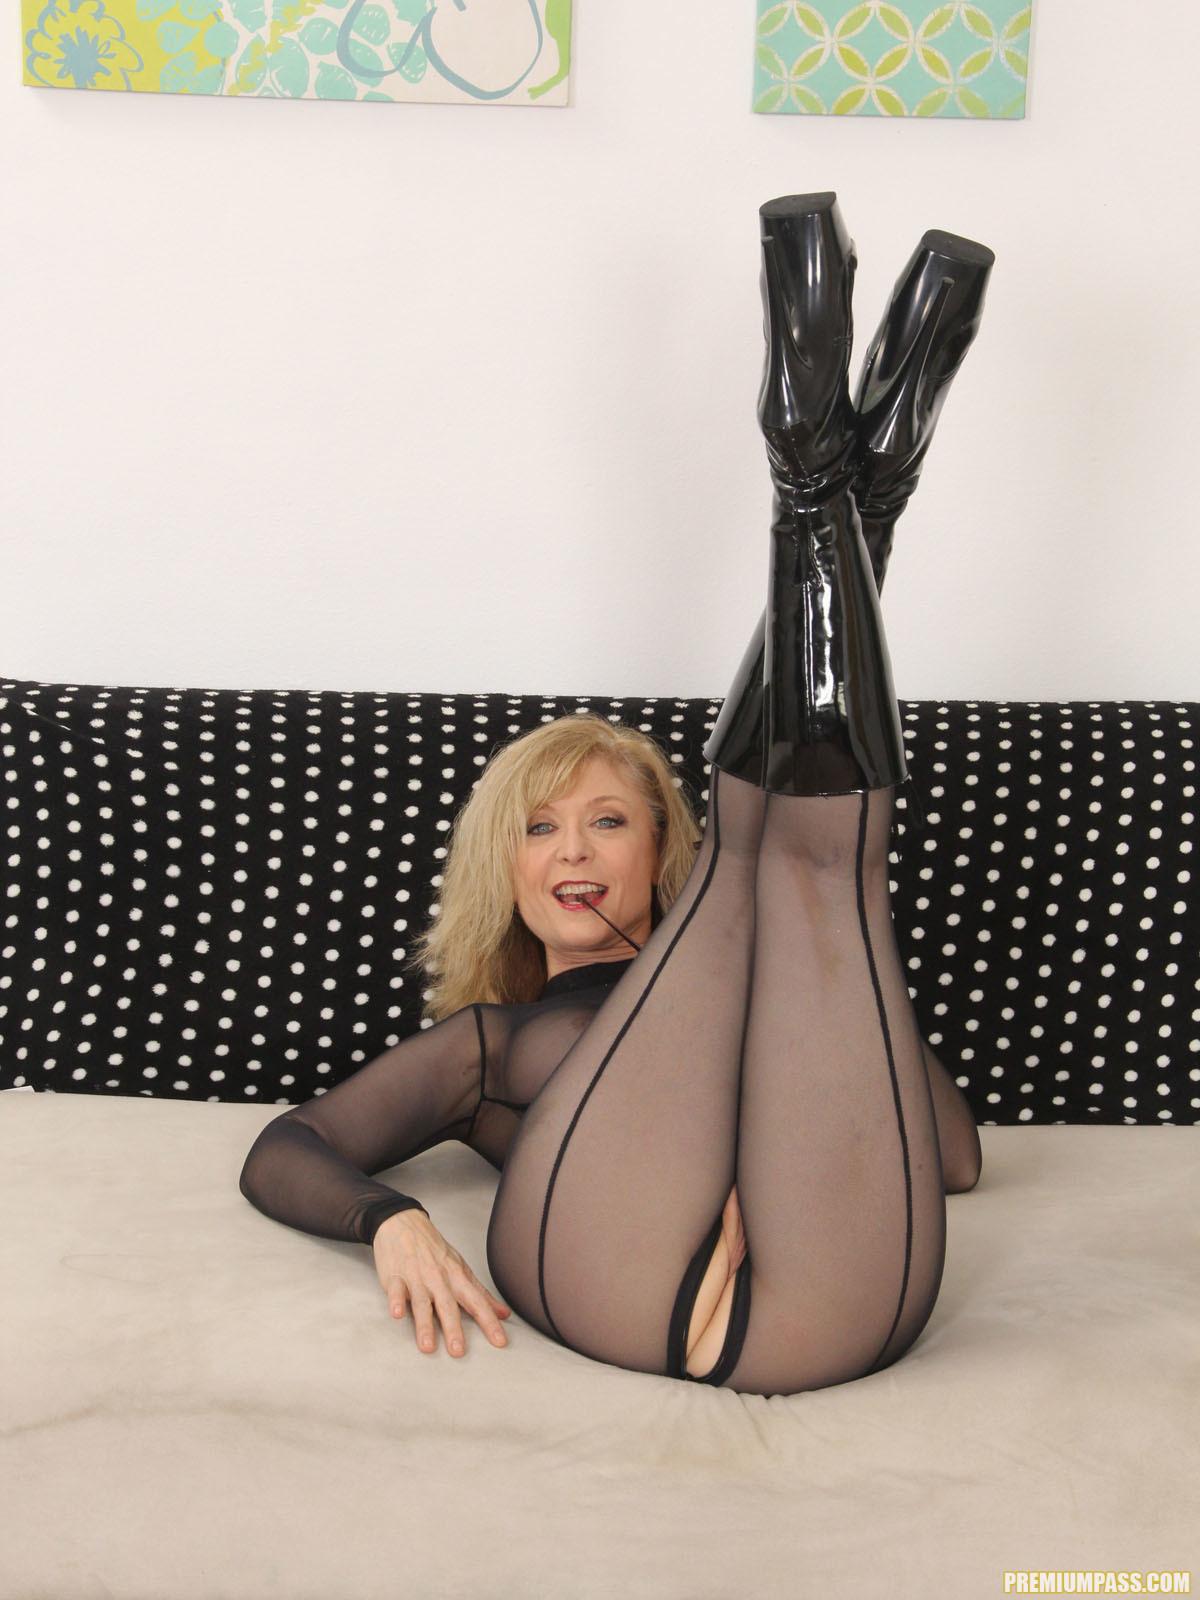 nina hartley full body pantyhose and face sitting